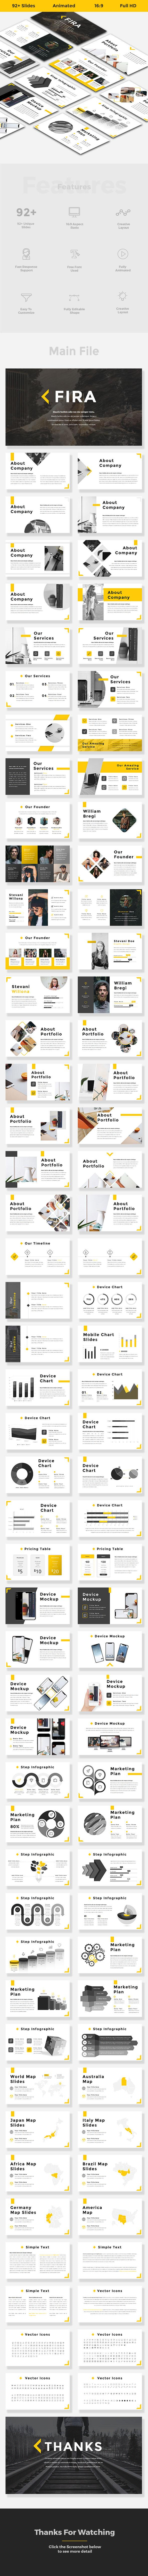 Fira - StartUp & Creative Keynote Template - Creative Keynote Templates